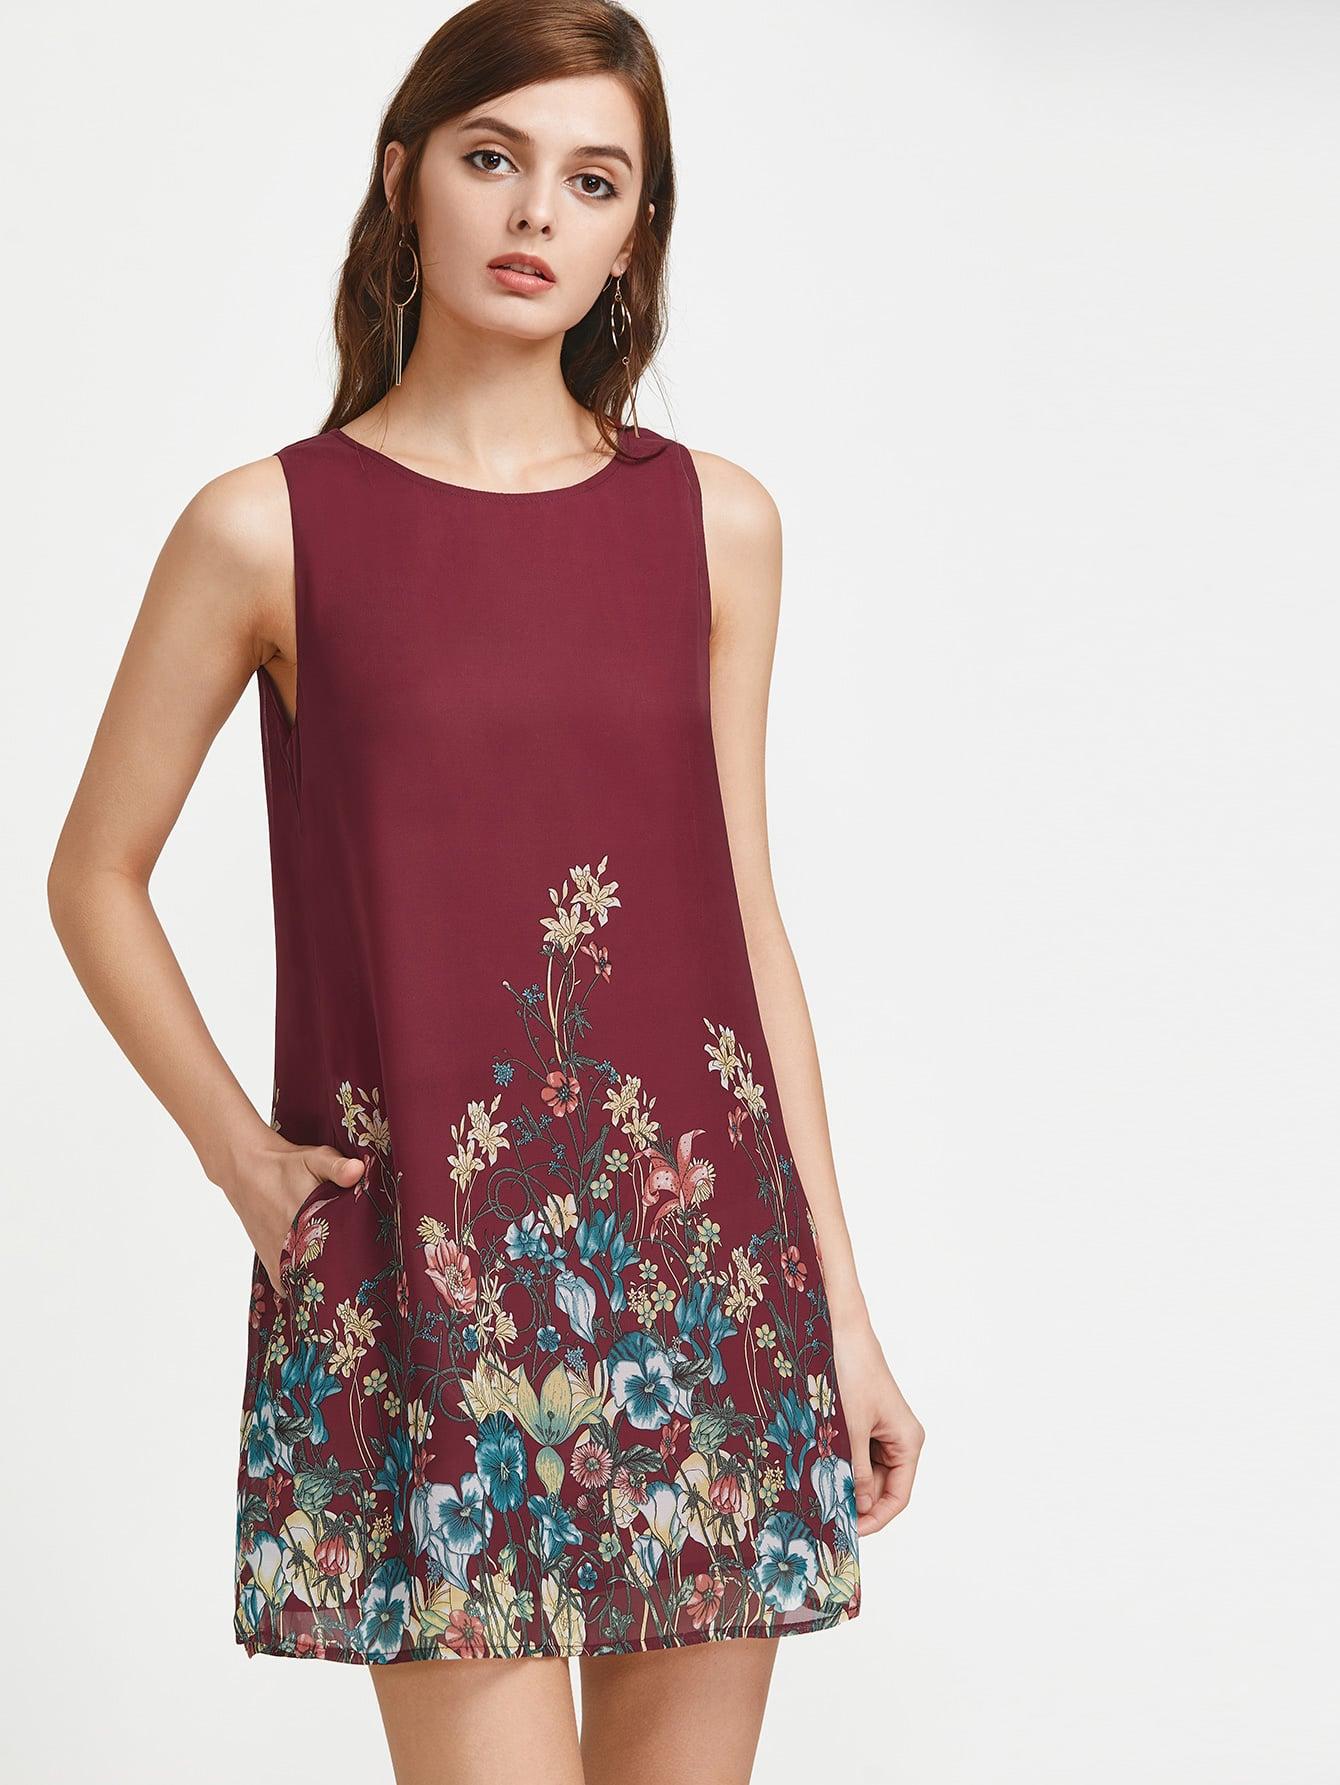 Фото Botanical Print Buttoned Keyhole Back Side Pocket Dress. Купить с доставкой